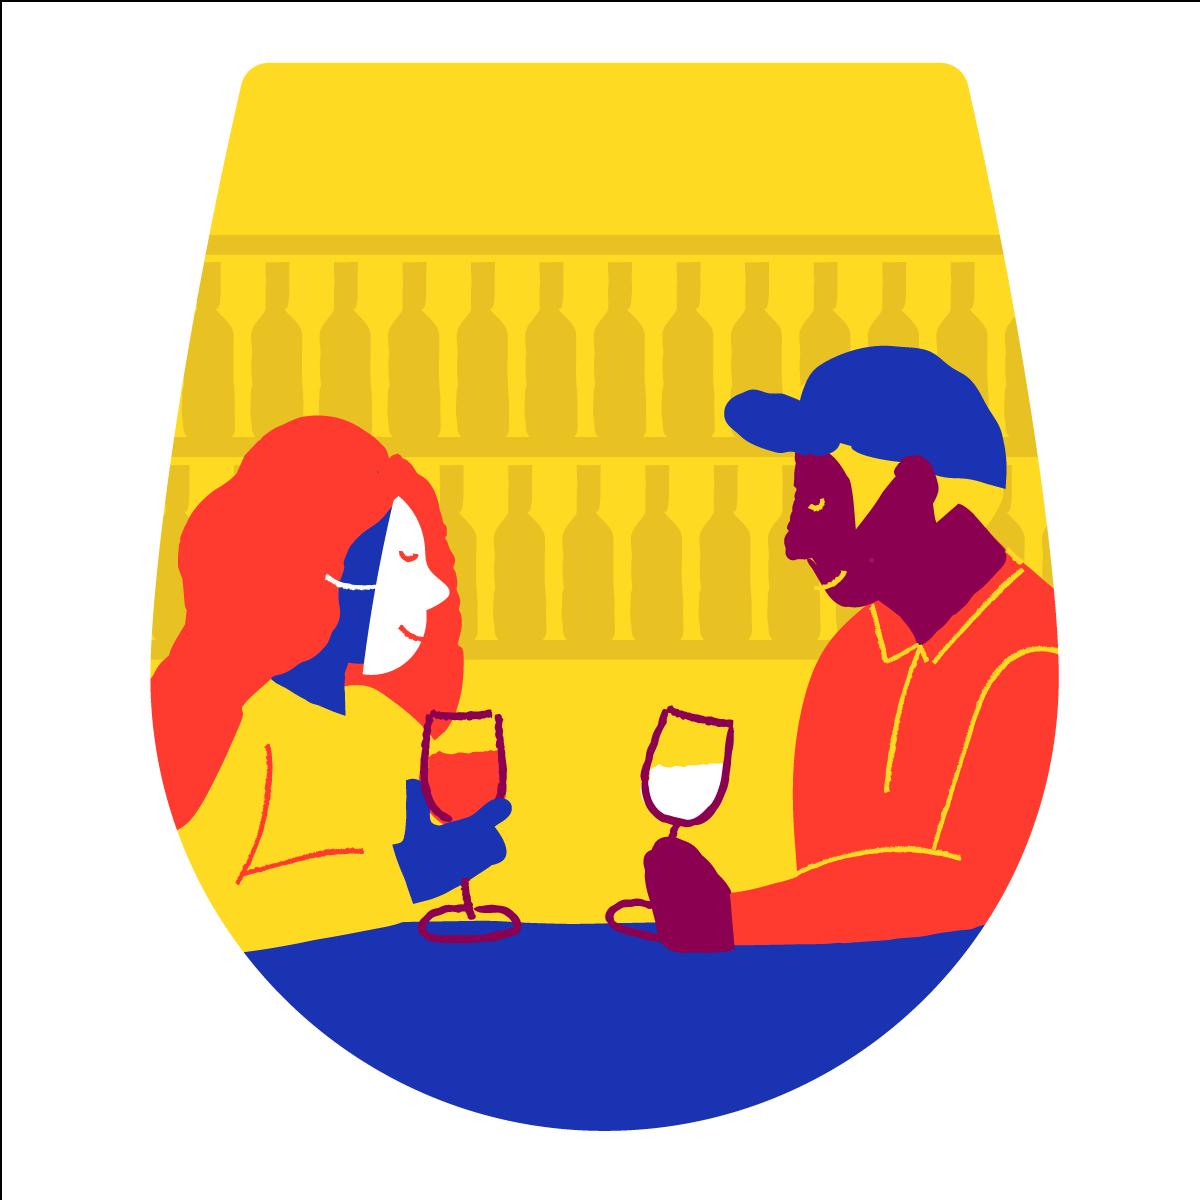 Preview wineguide